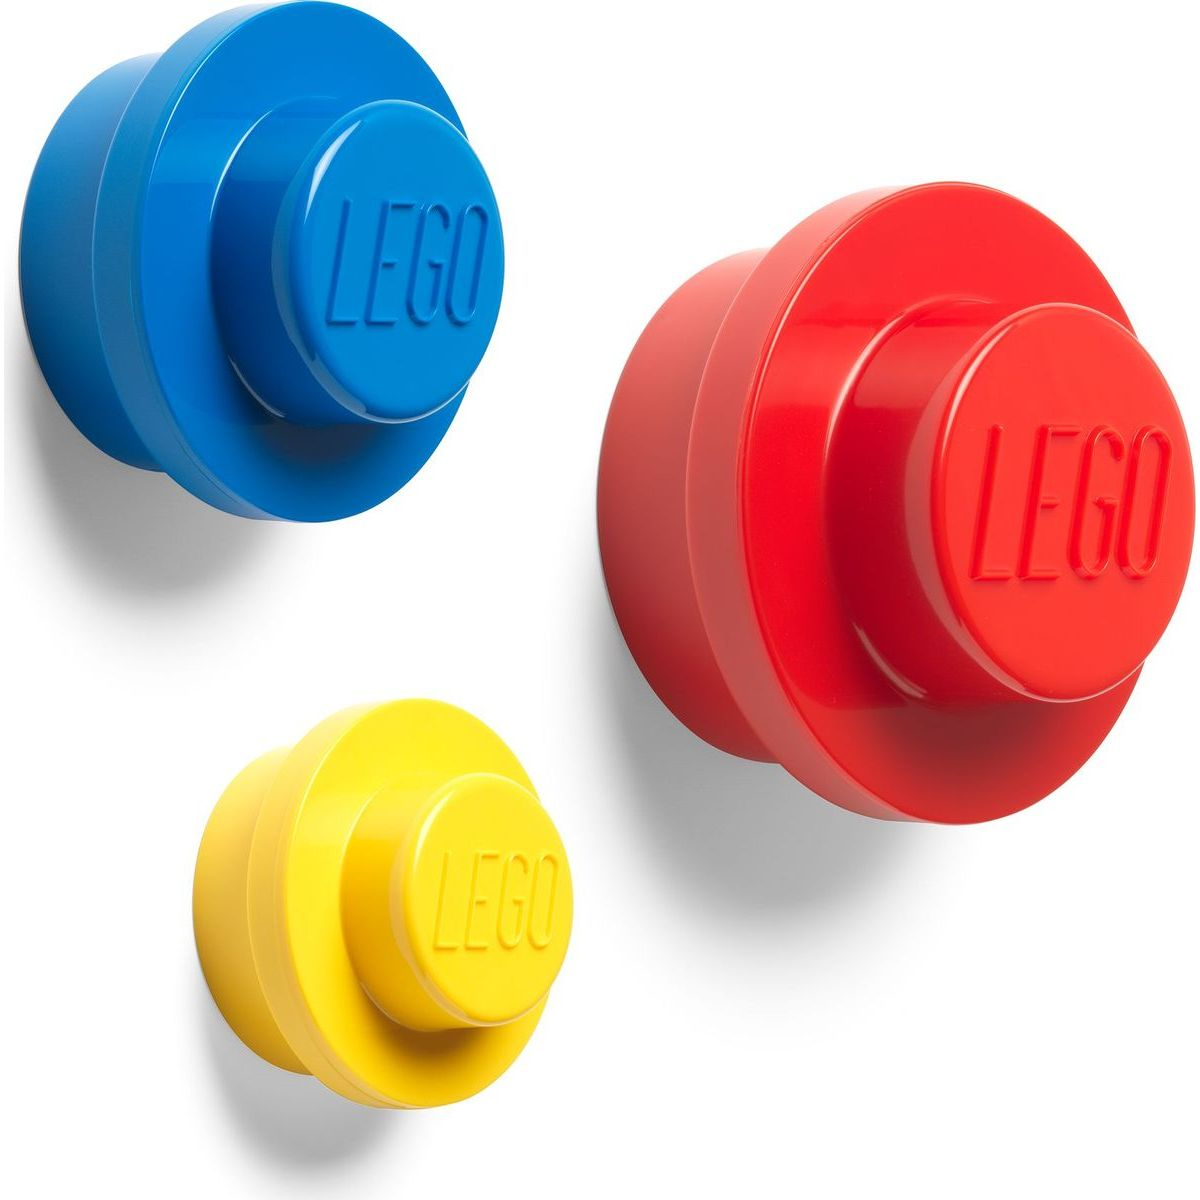 LEGO® věšák na zeď, 3 ks - žlutá, modrá, červená